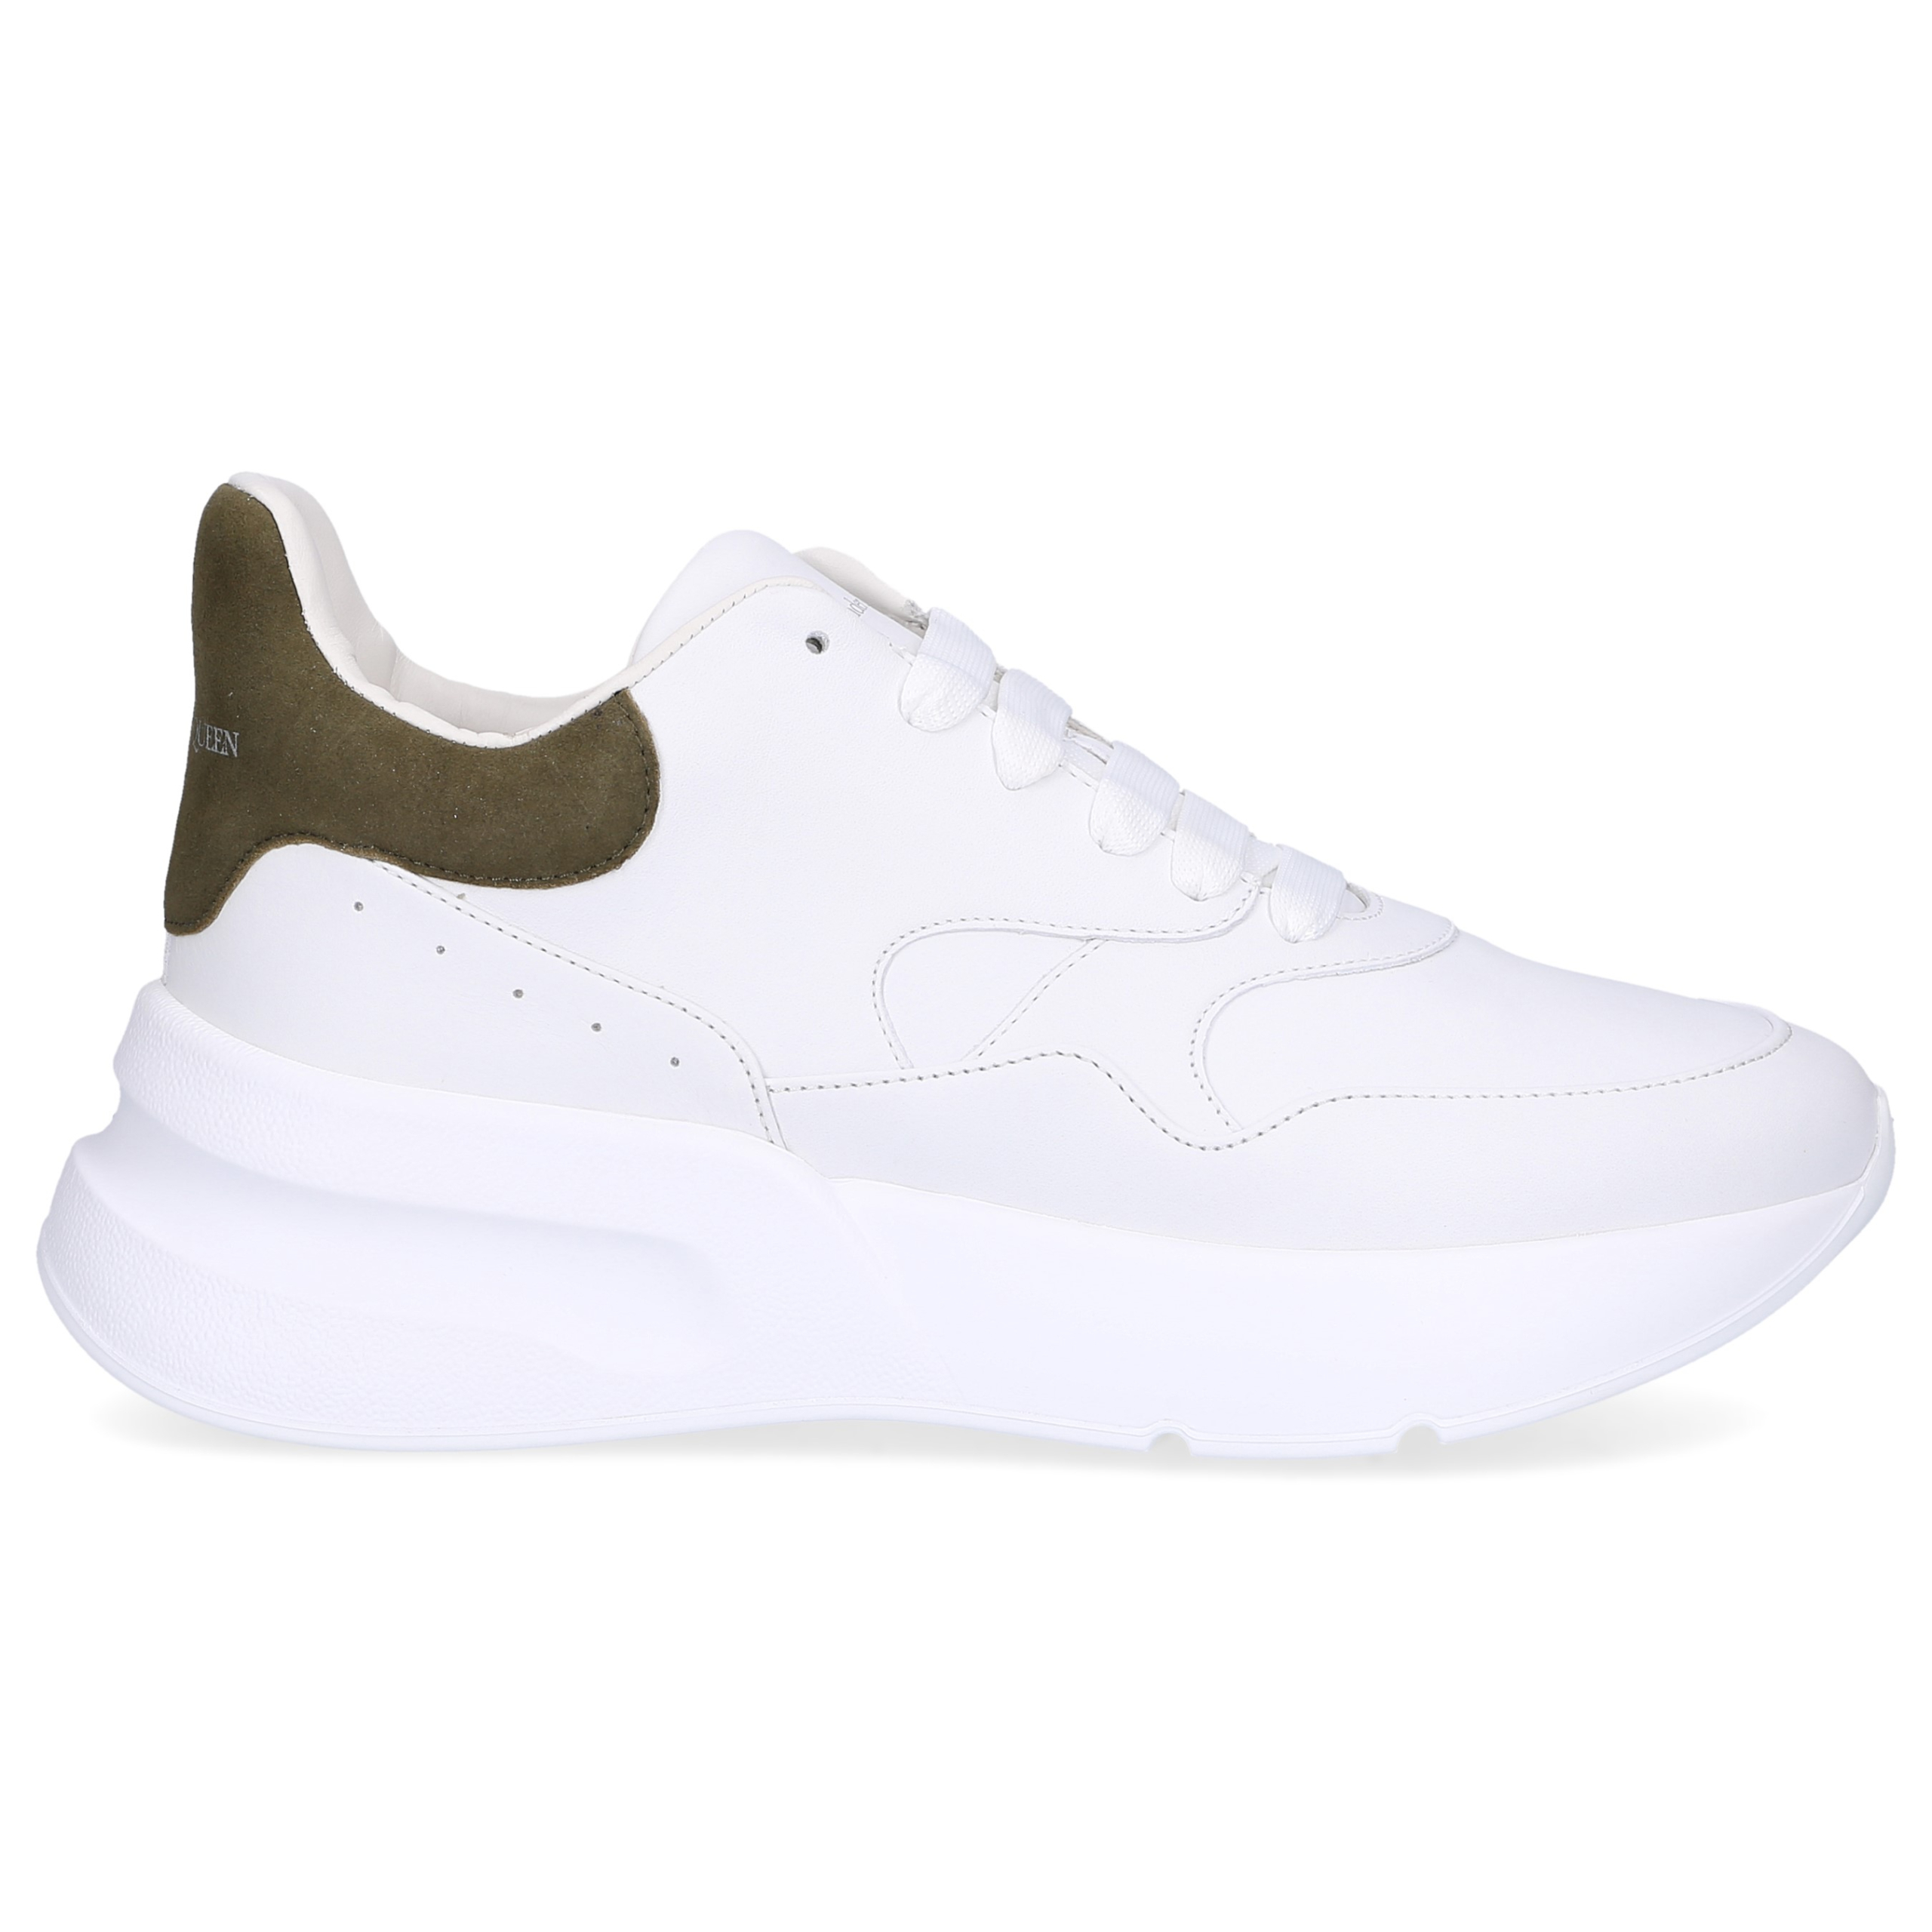 Sneaker low JOEY Nappaleder Logo weiß khaki